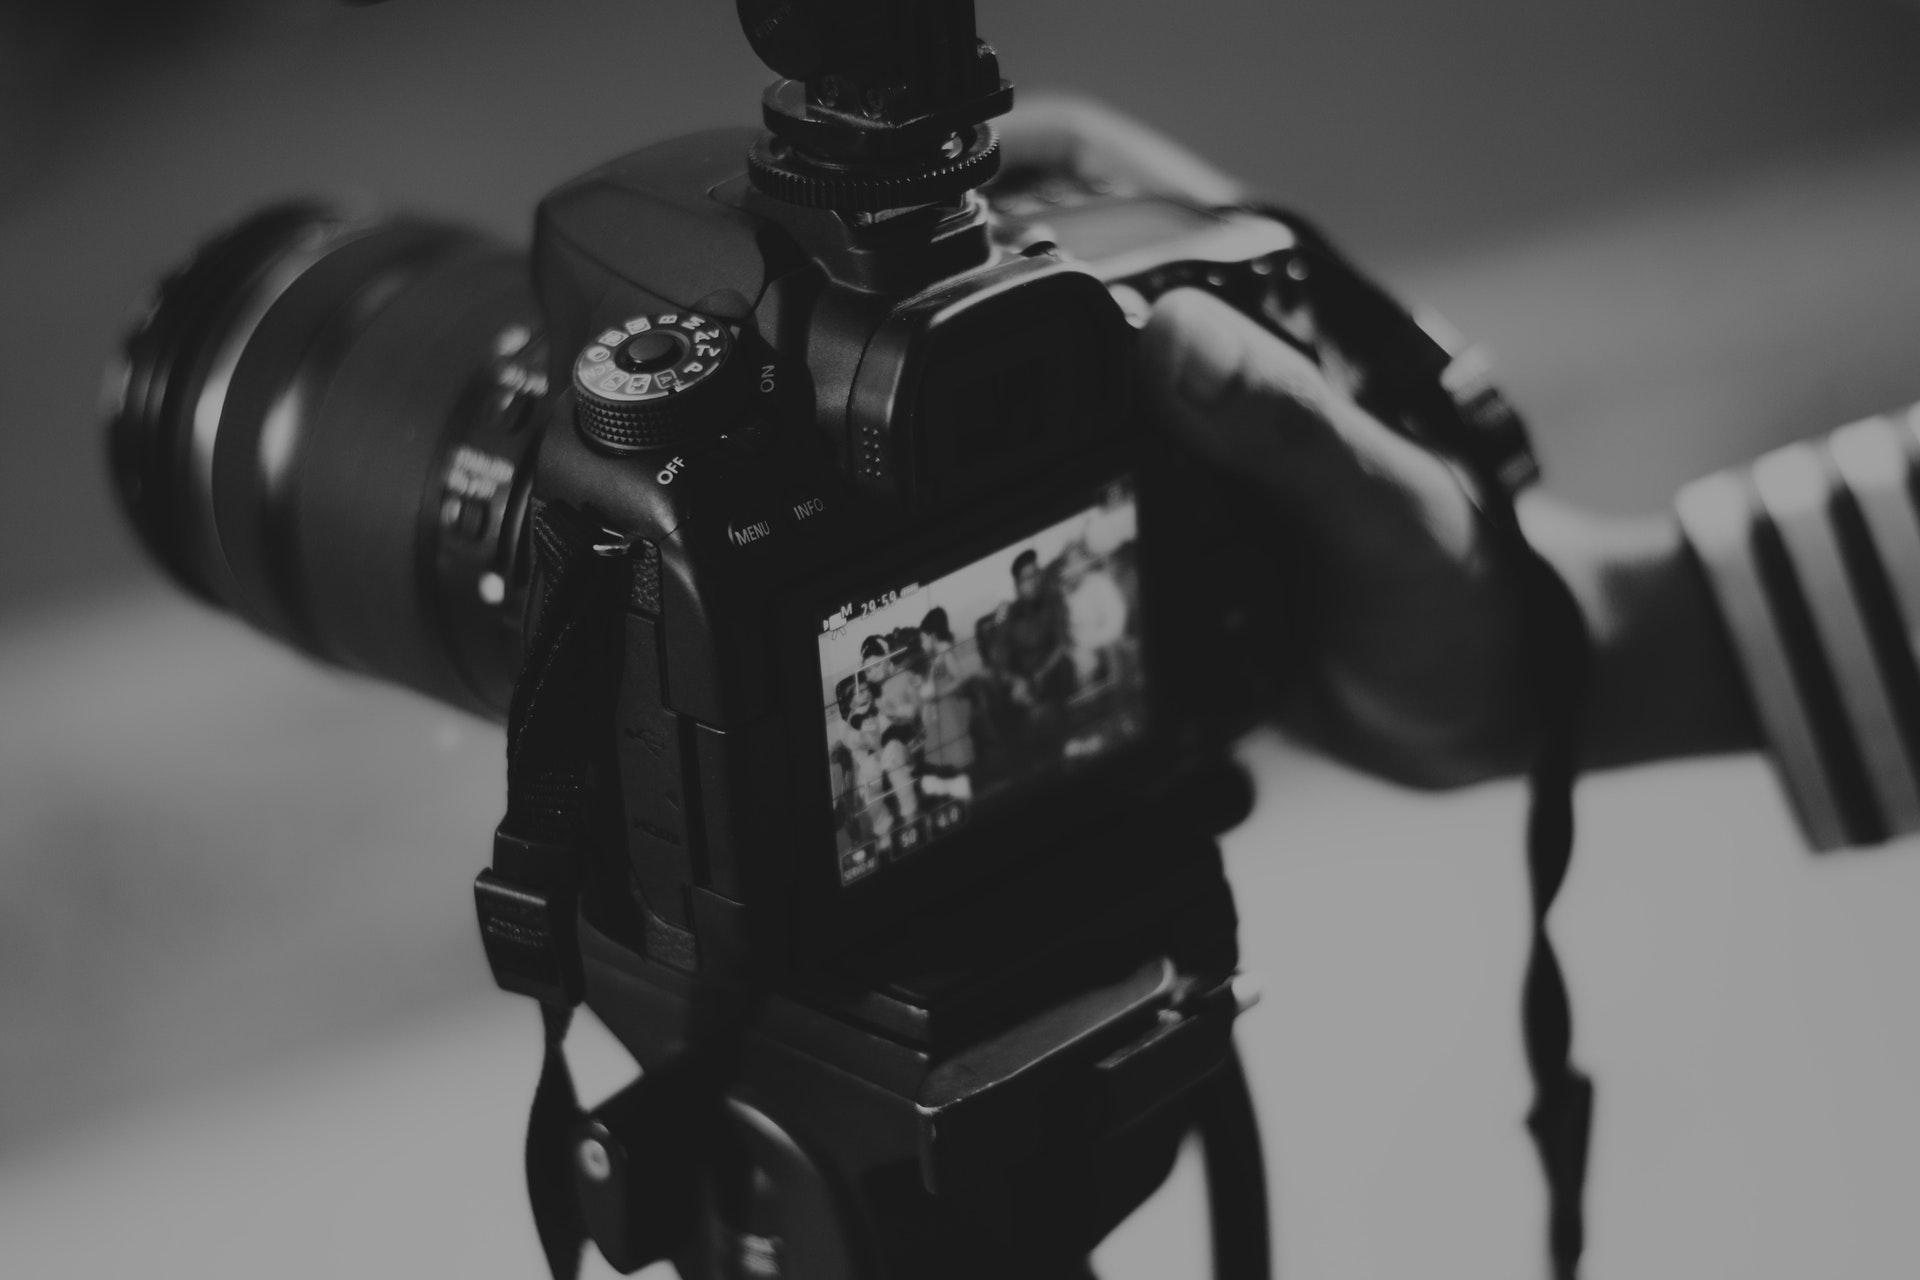 Focus on Digital Storytelling, Part 2